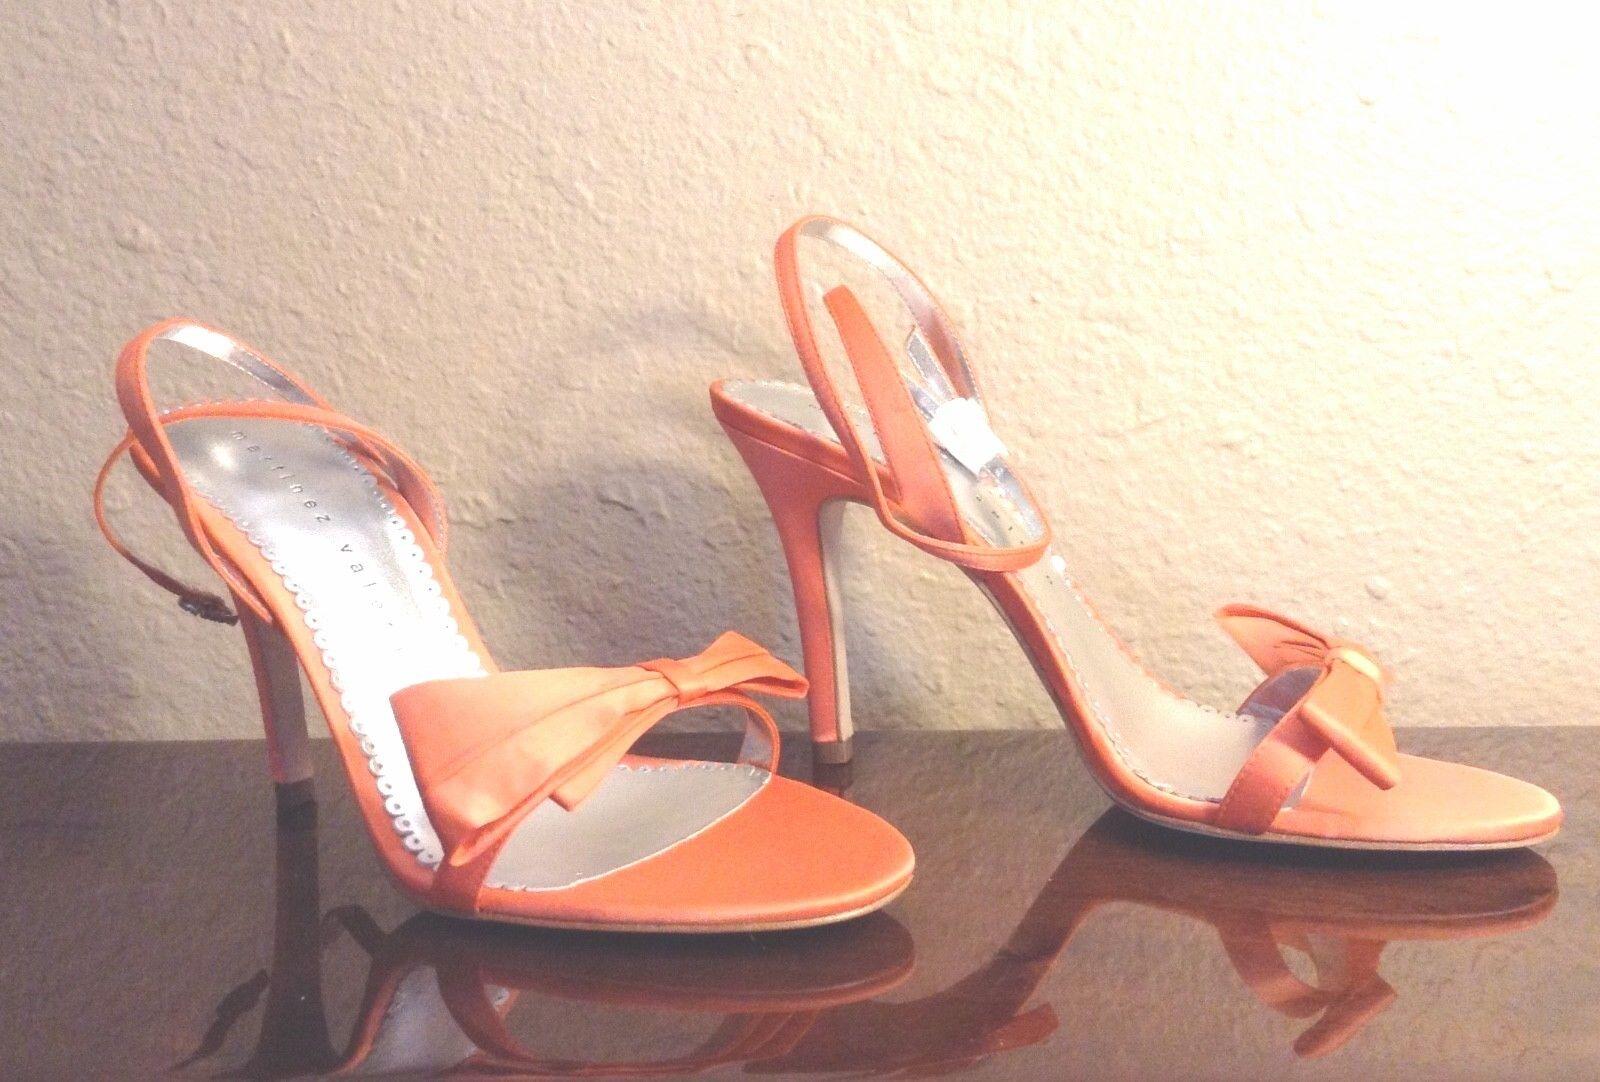 NEW MARTINEZ VALERO Satin Strappy STILETTO High Heel Heel Heel Ankle Strap Sandal 8.5M 39 004e84